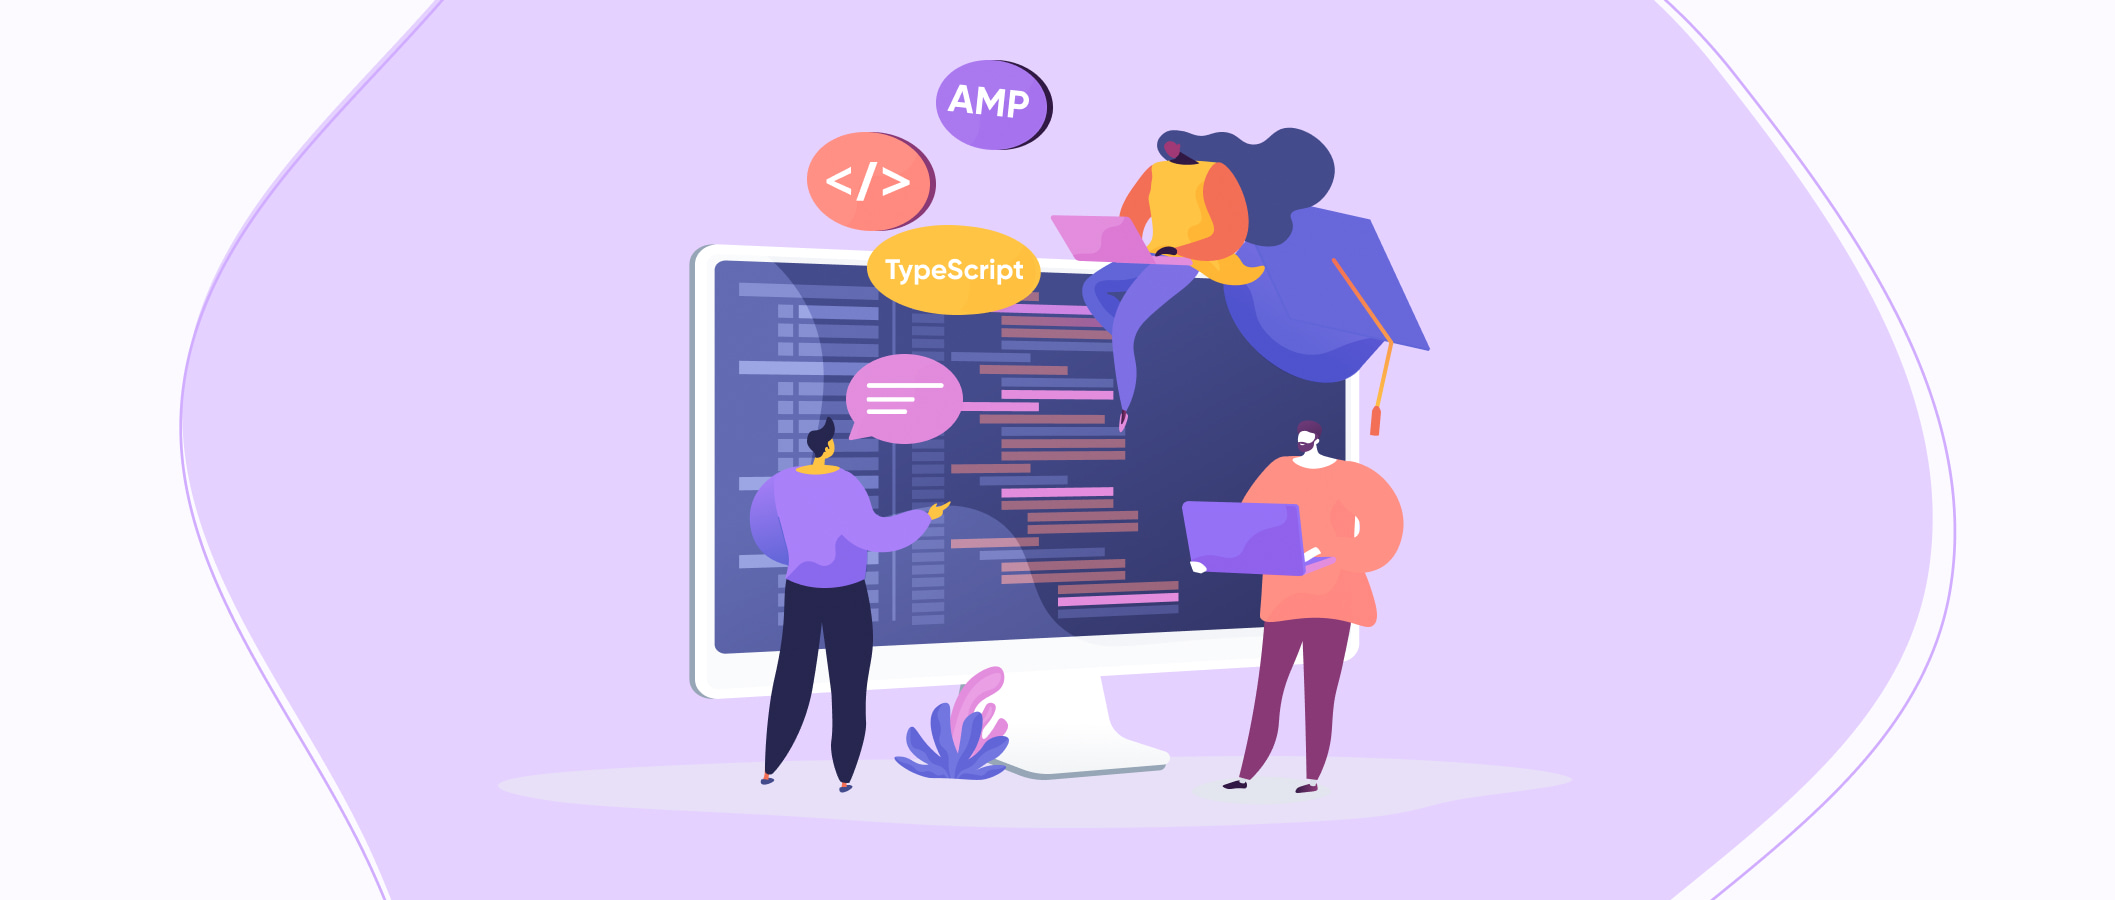 TypeScript Development